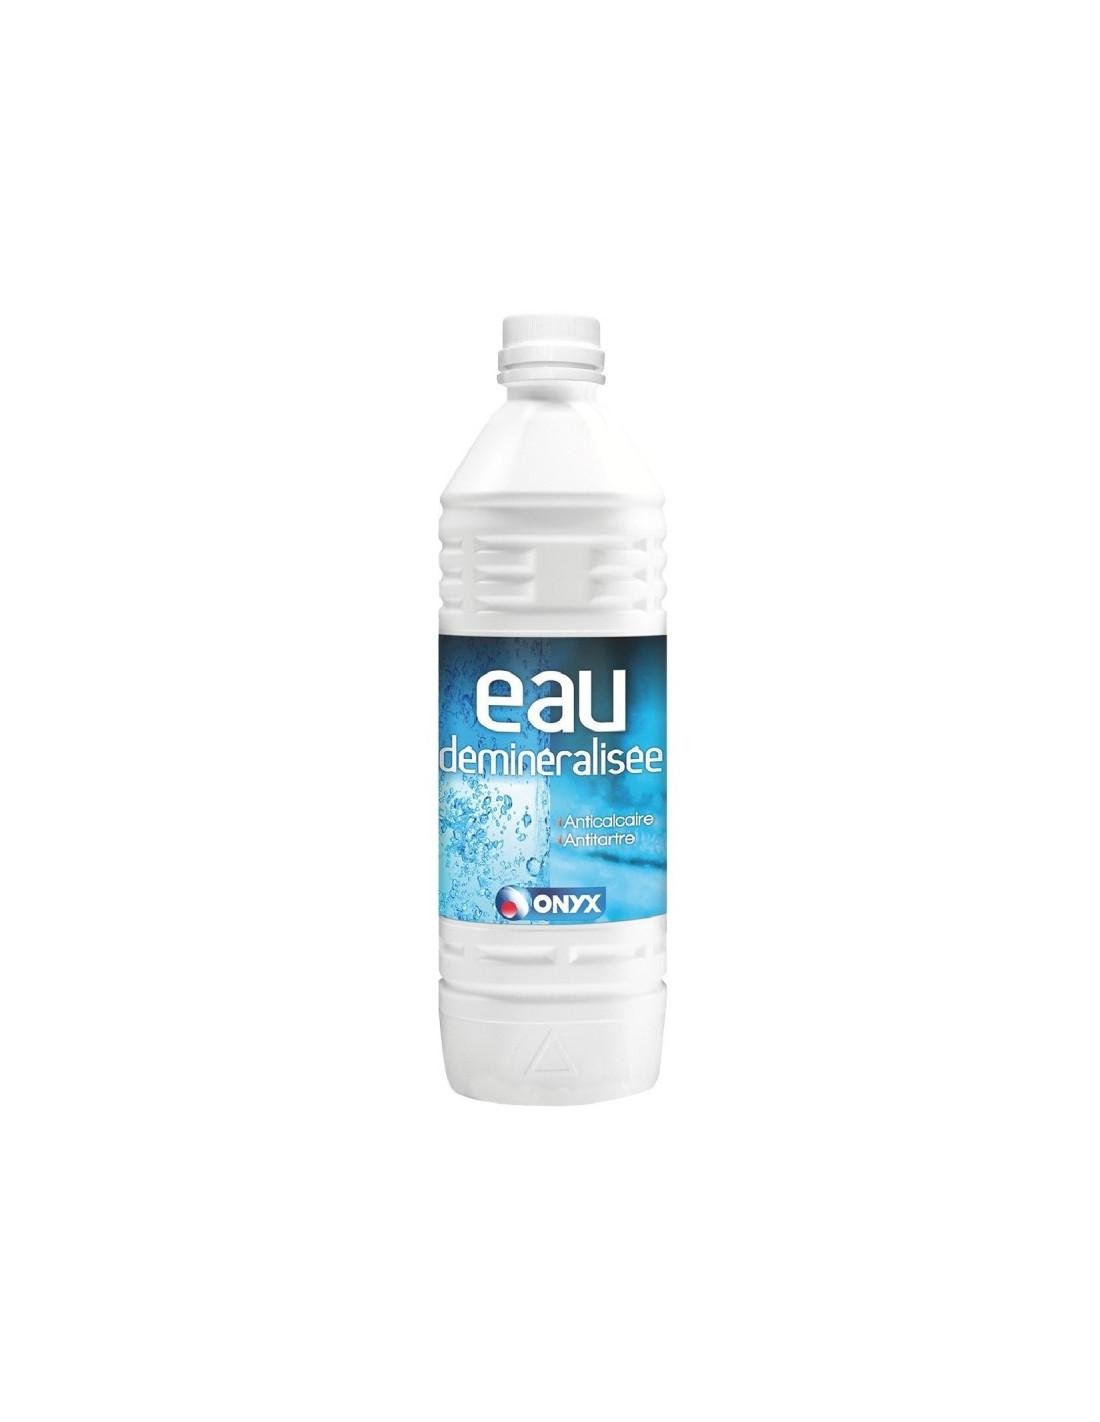 Onyx eau d min ralis e 1l hyper brico - Eau demineralisee prix ...